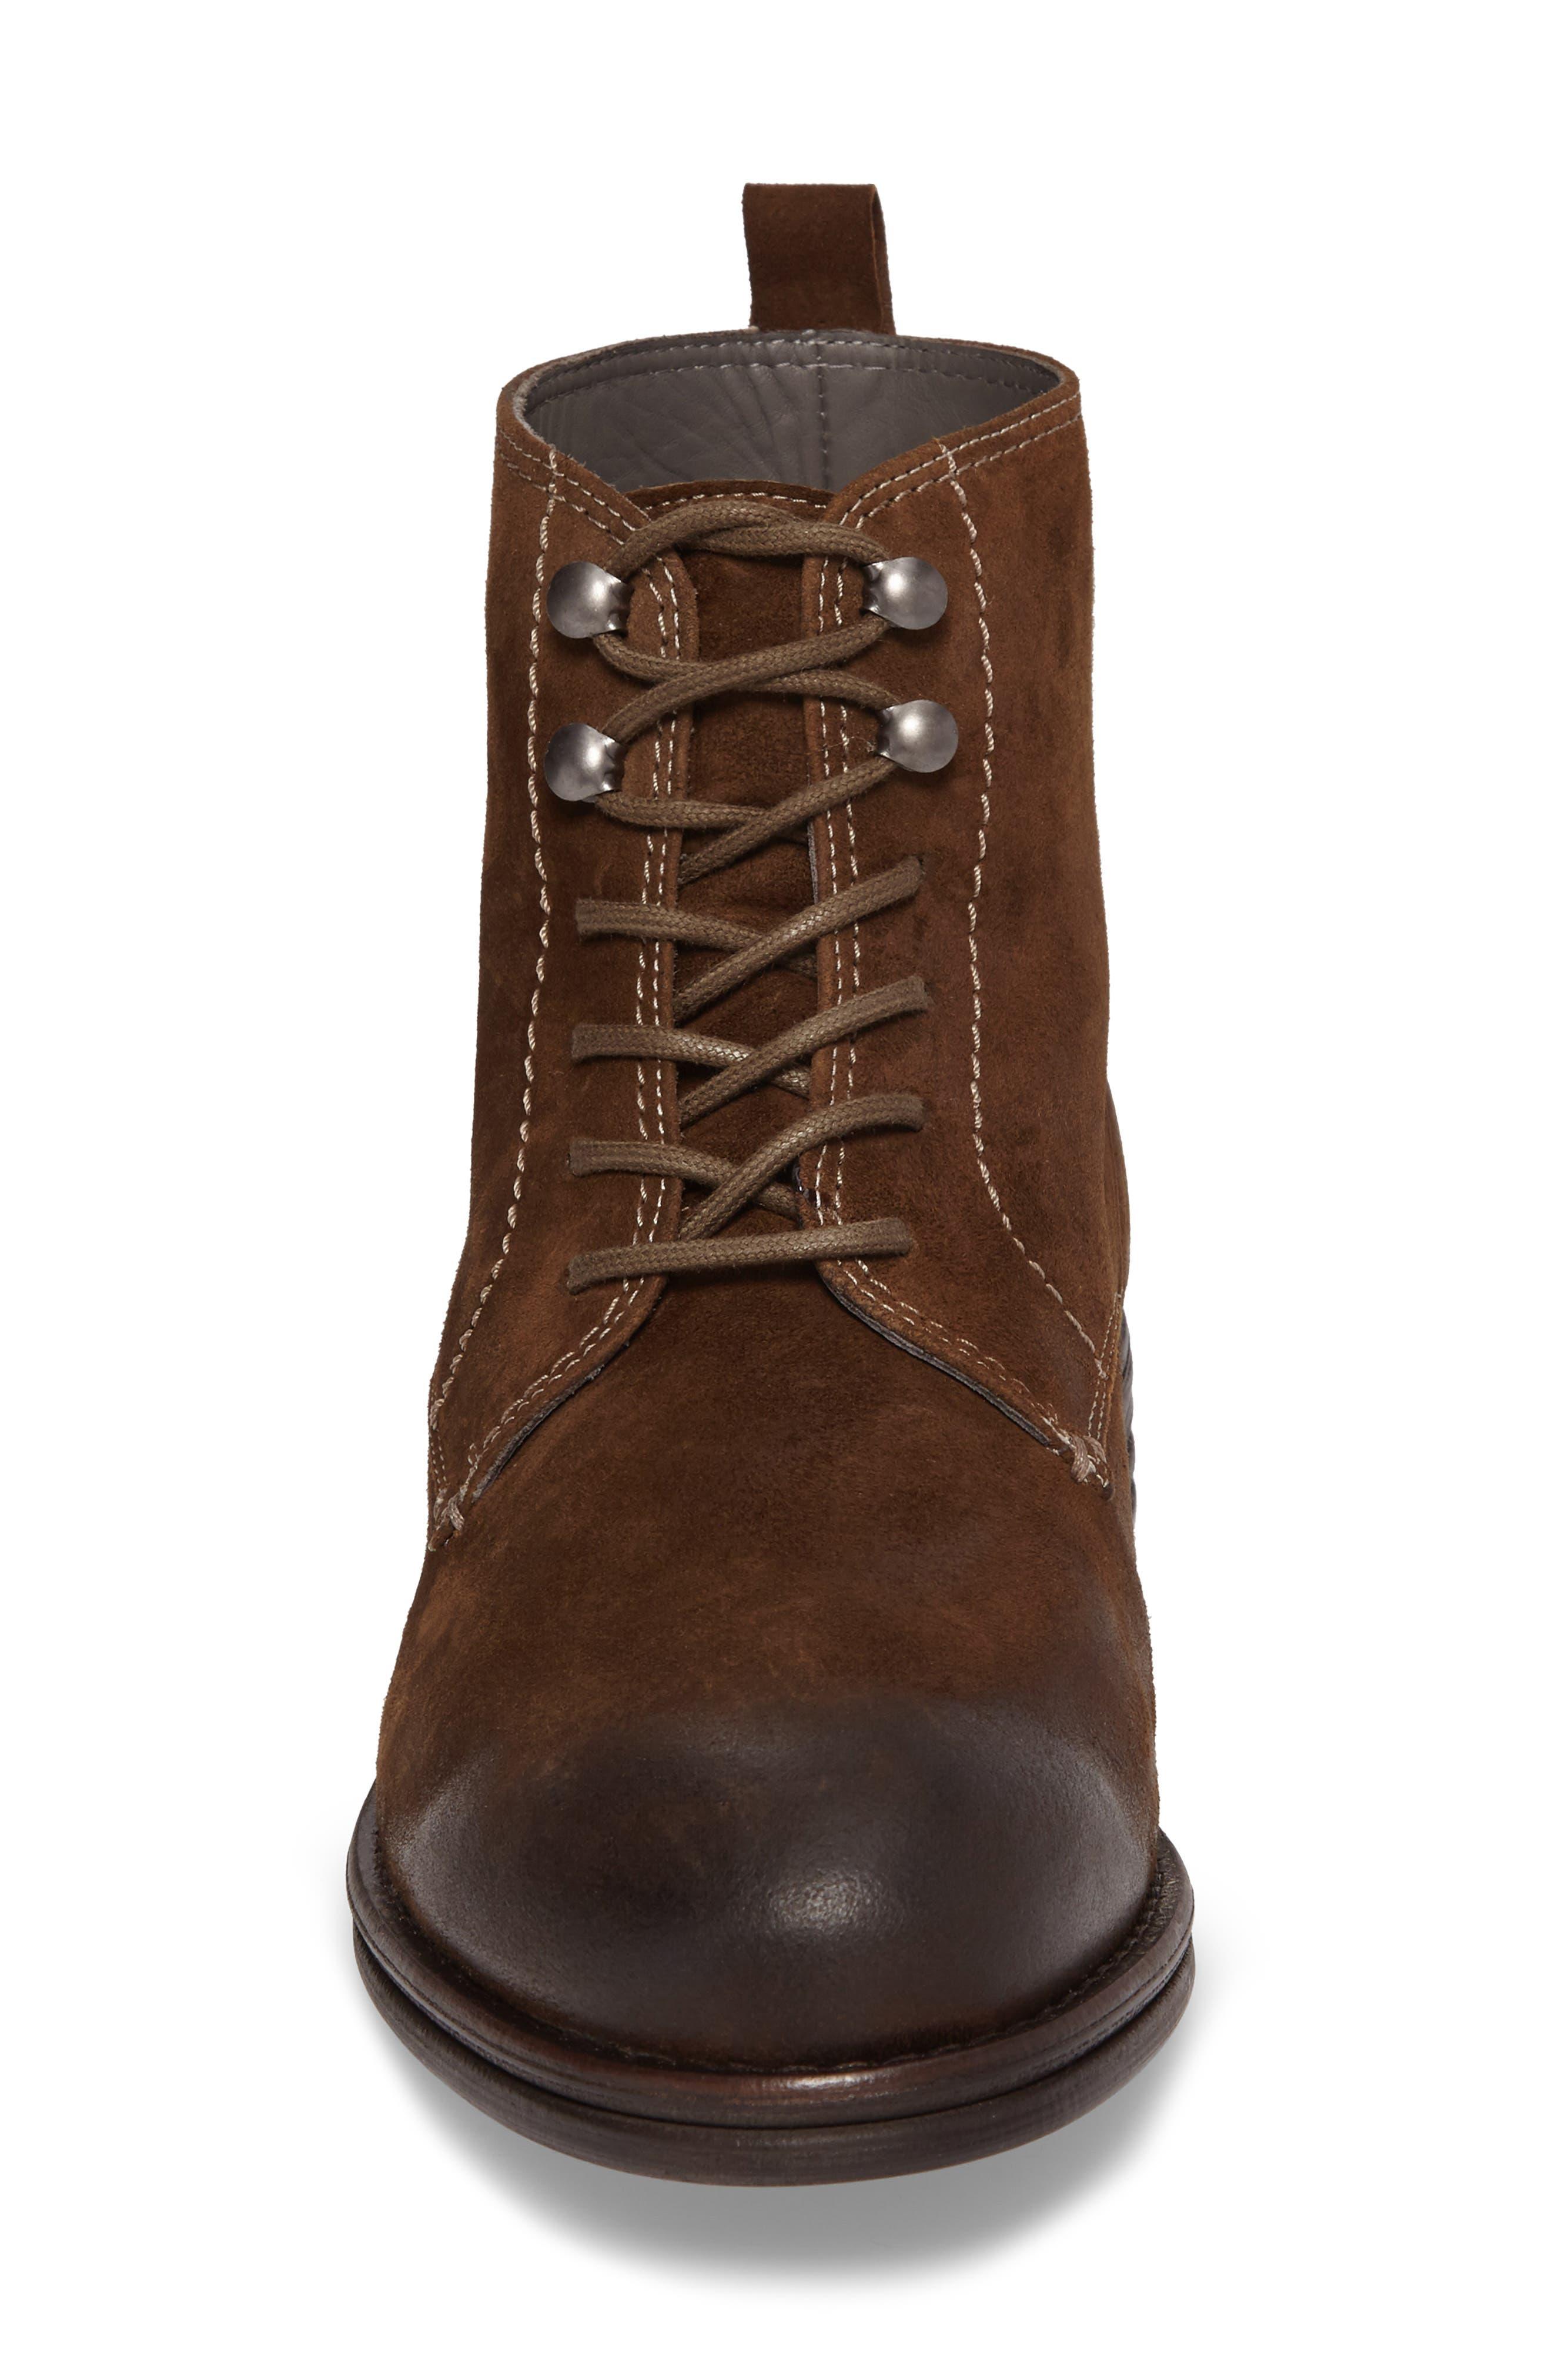 Cordie Plain Toe Boot,                             Alternate thumbnail 4, color,                             Oliva Suede